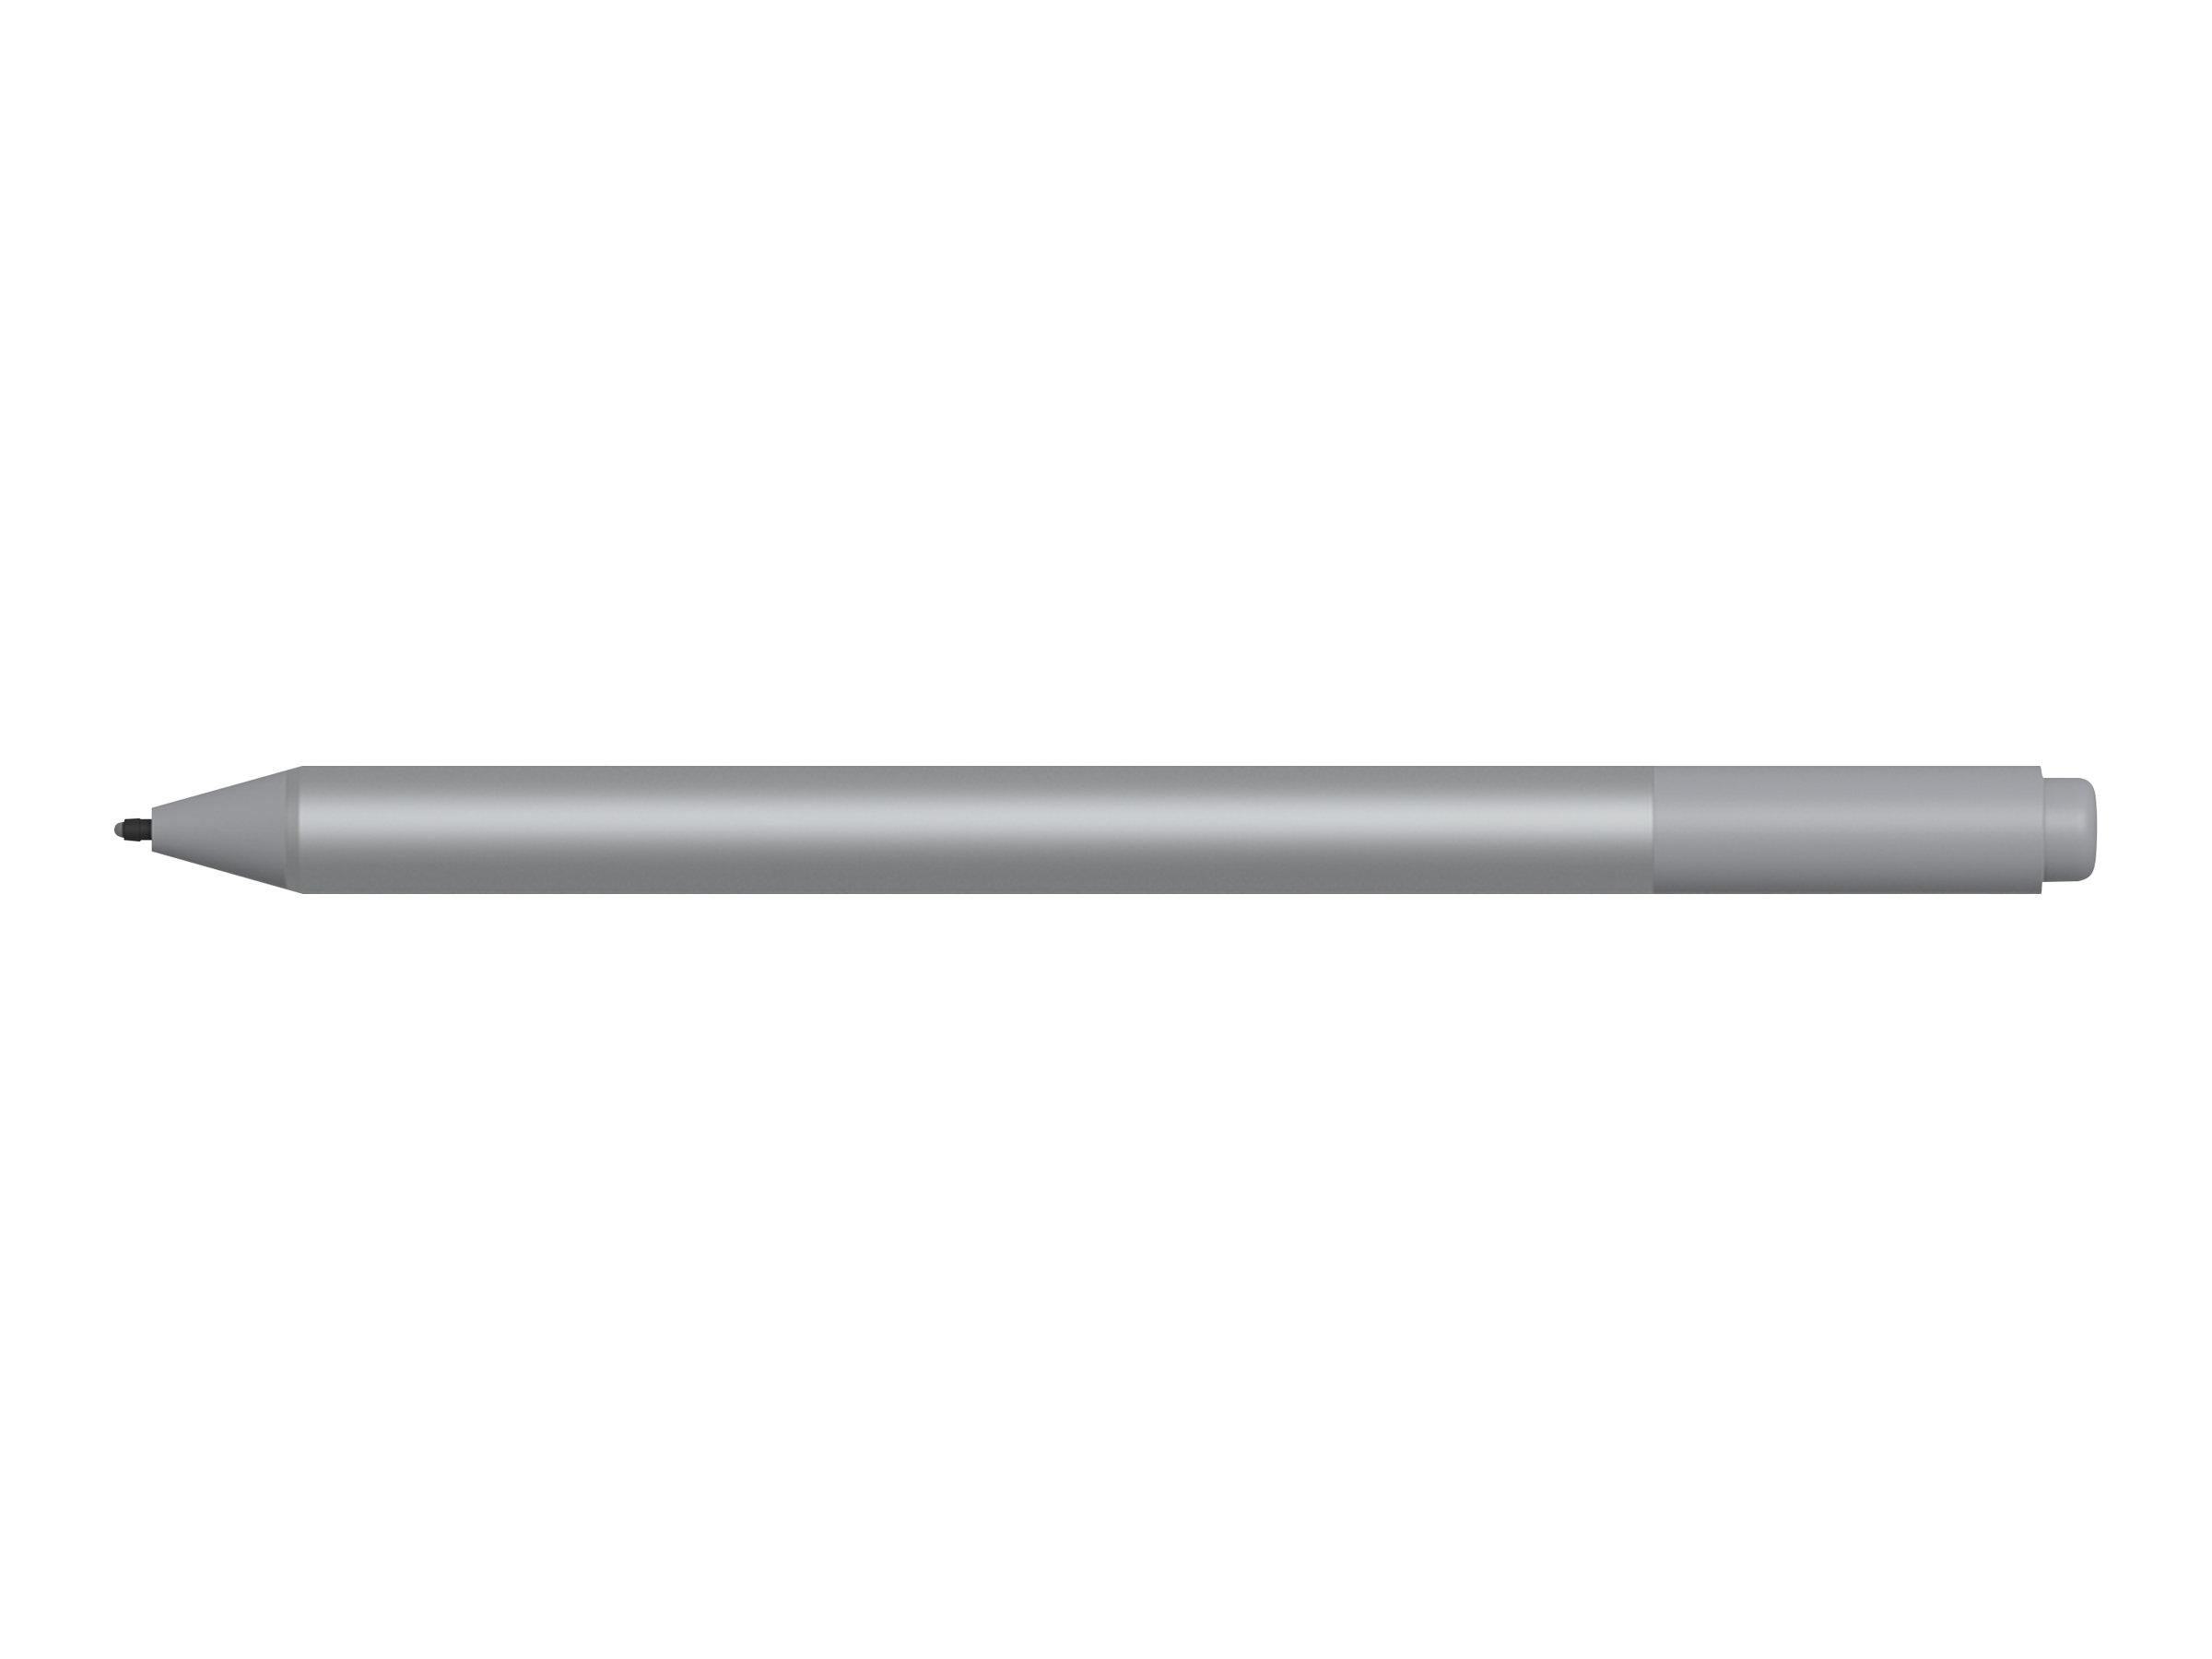 Microsoft Surface Pen - Stift - 2 Tasten - kabellos - Bluetooth 4.0 - Platin